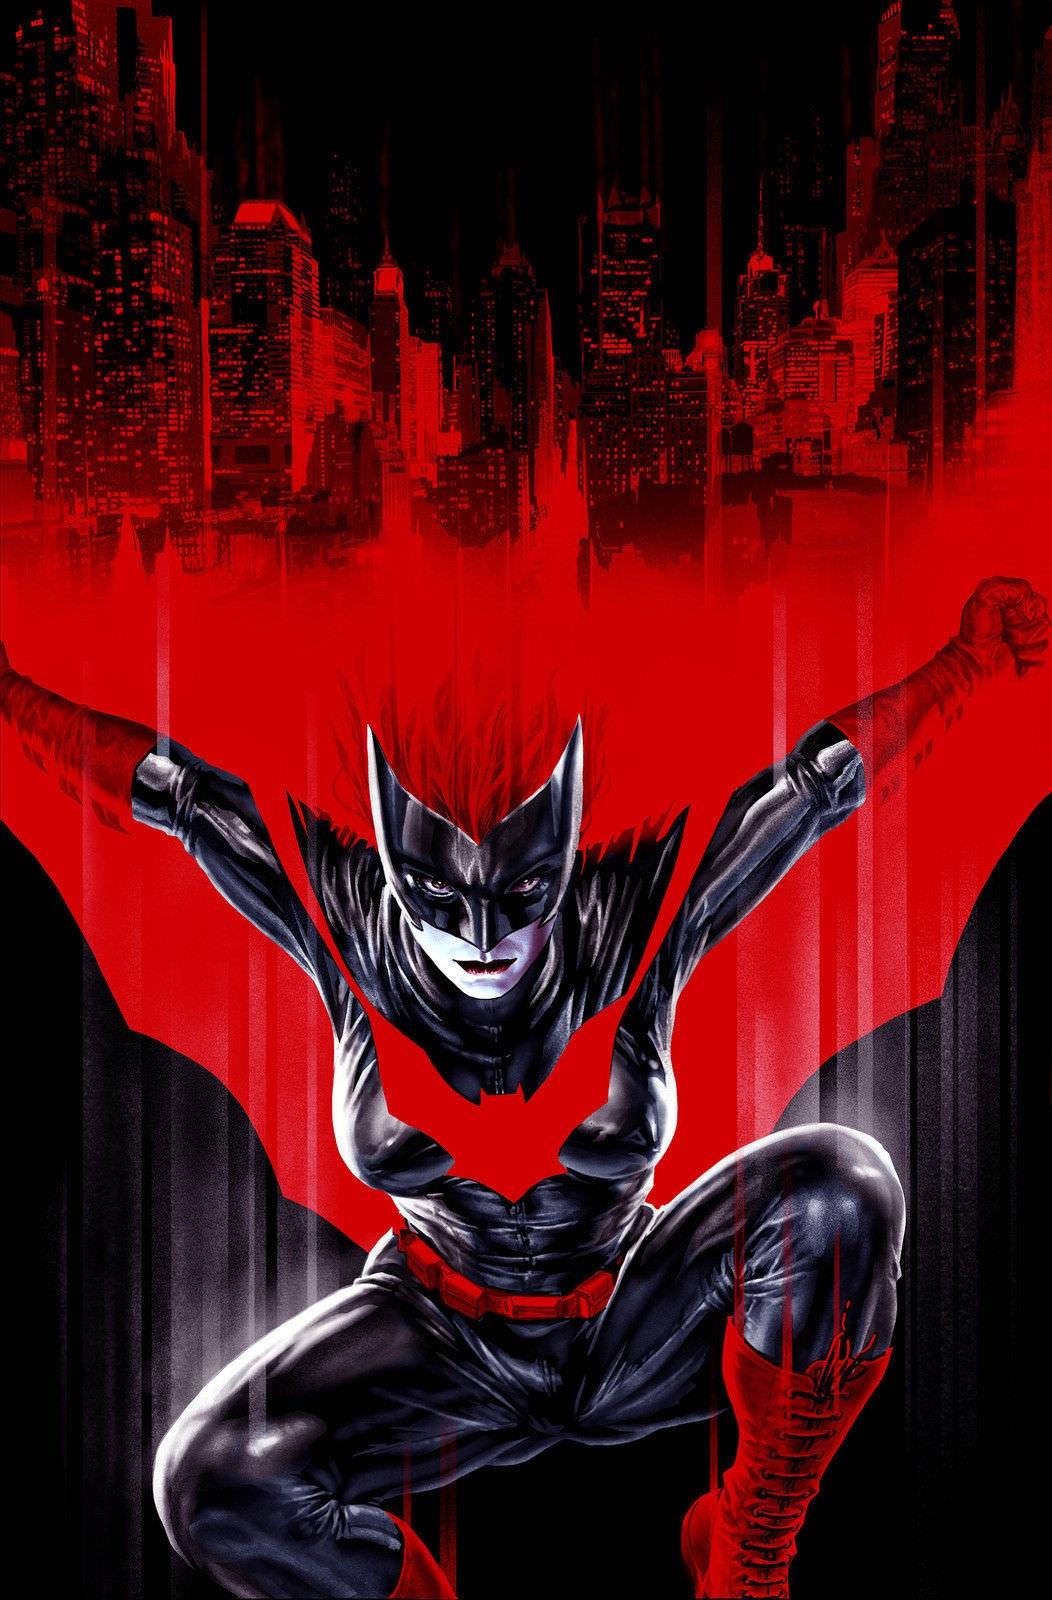 Batwoman Vol 3 13 Textless Variant.jpg